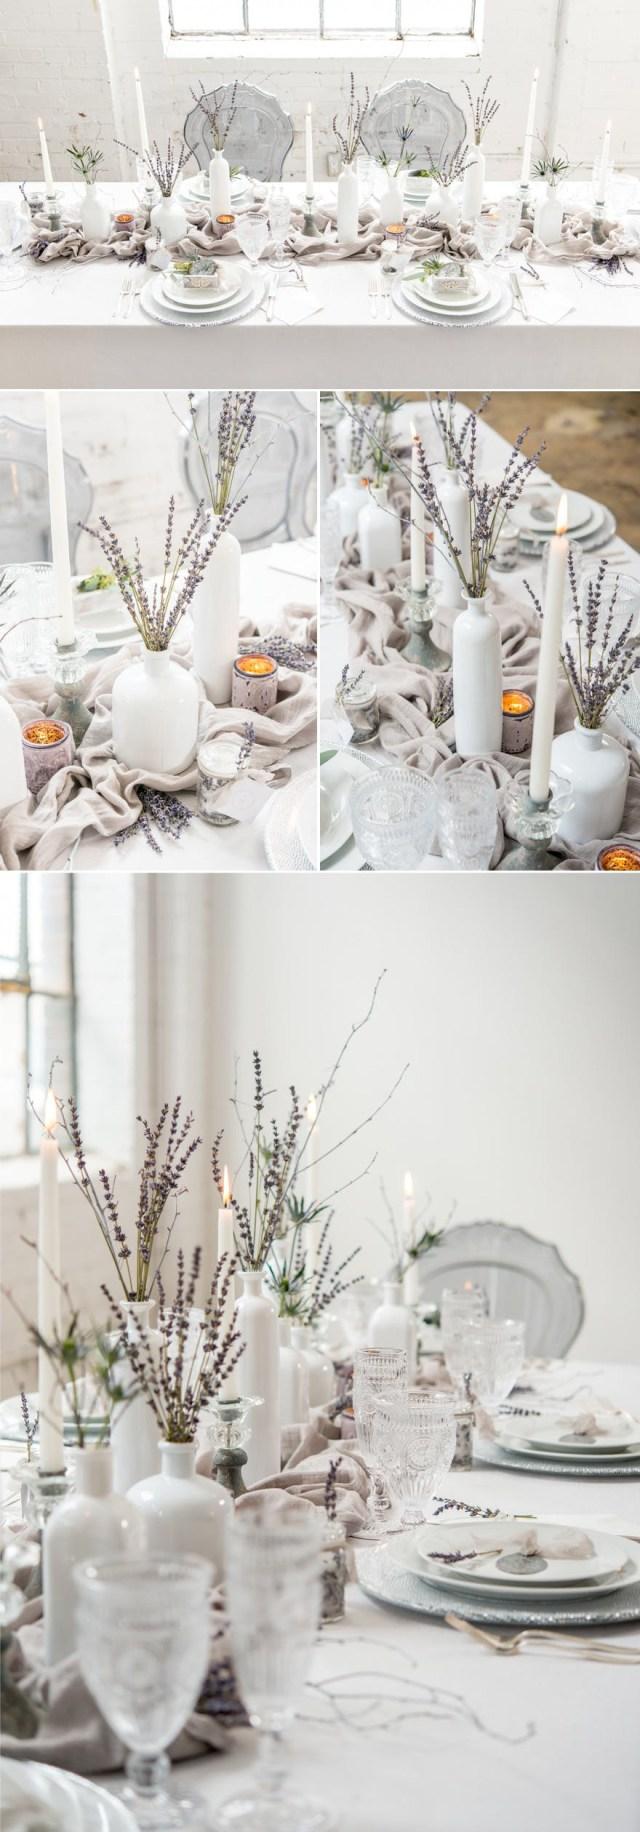 Decor Wedding Diy 50 Stunning Diy Wedding Centrepieces Ideas And Inspiration